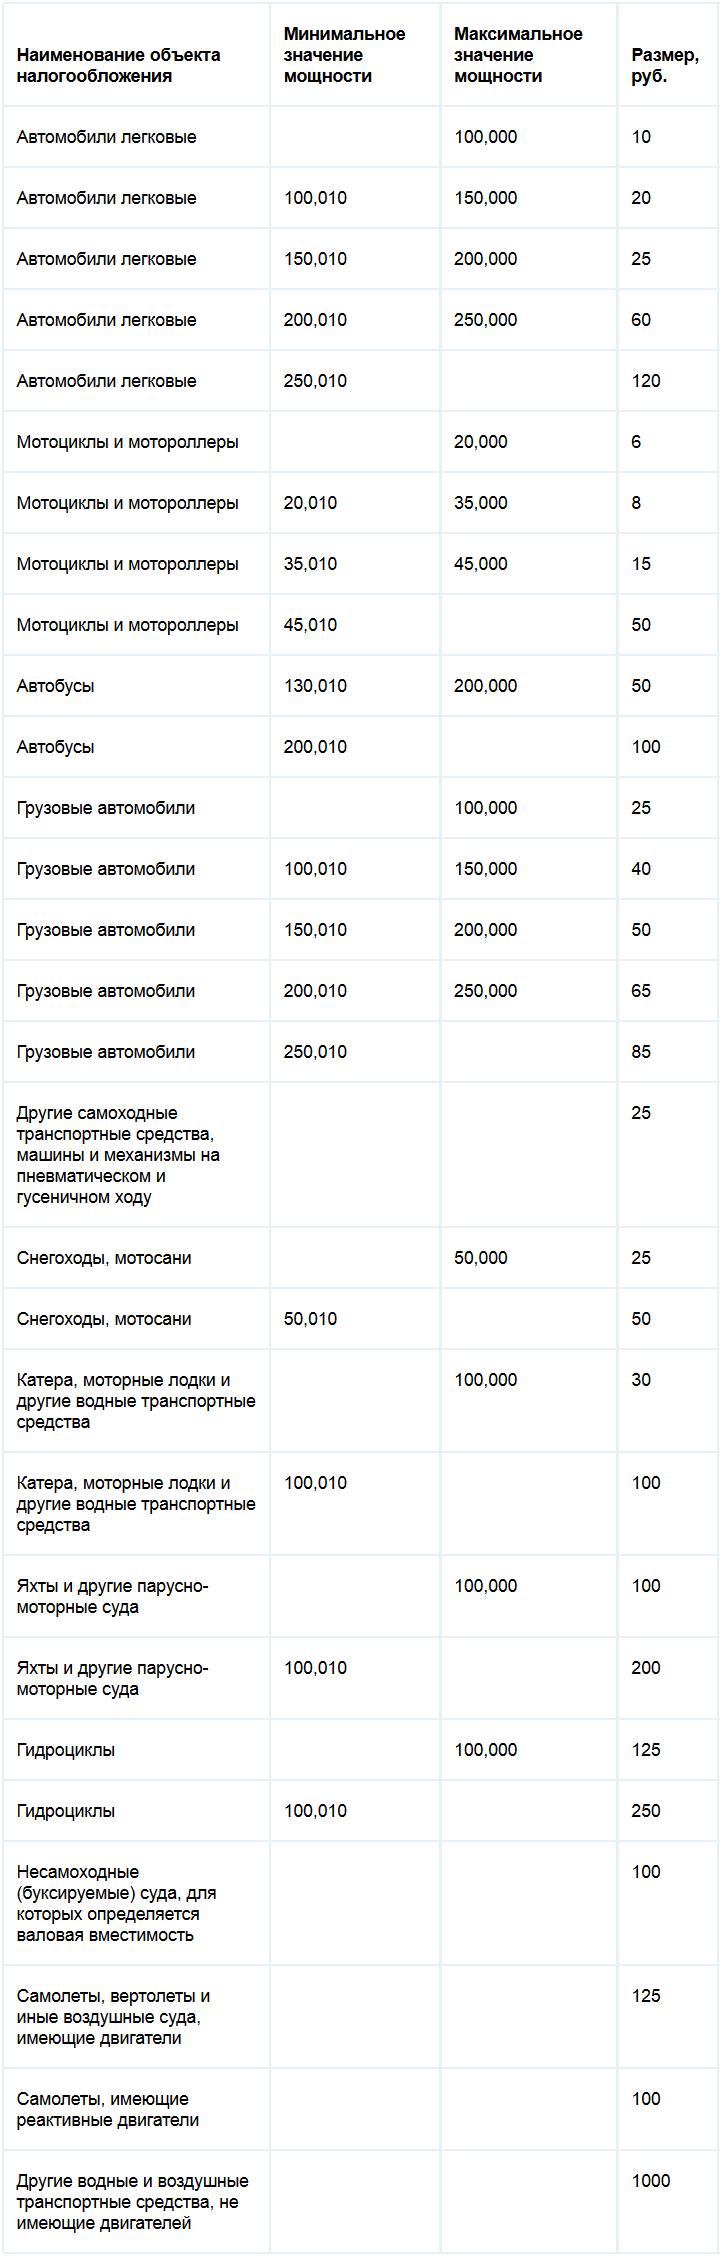 Ставки транспортного налога Алтайского края